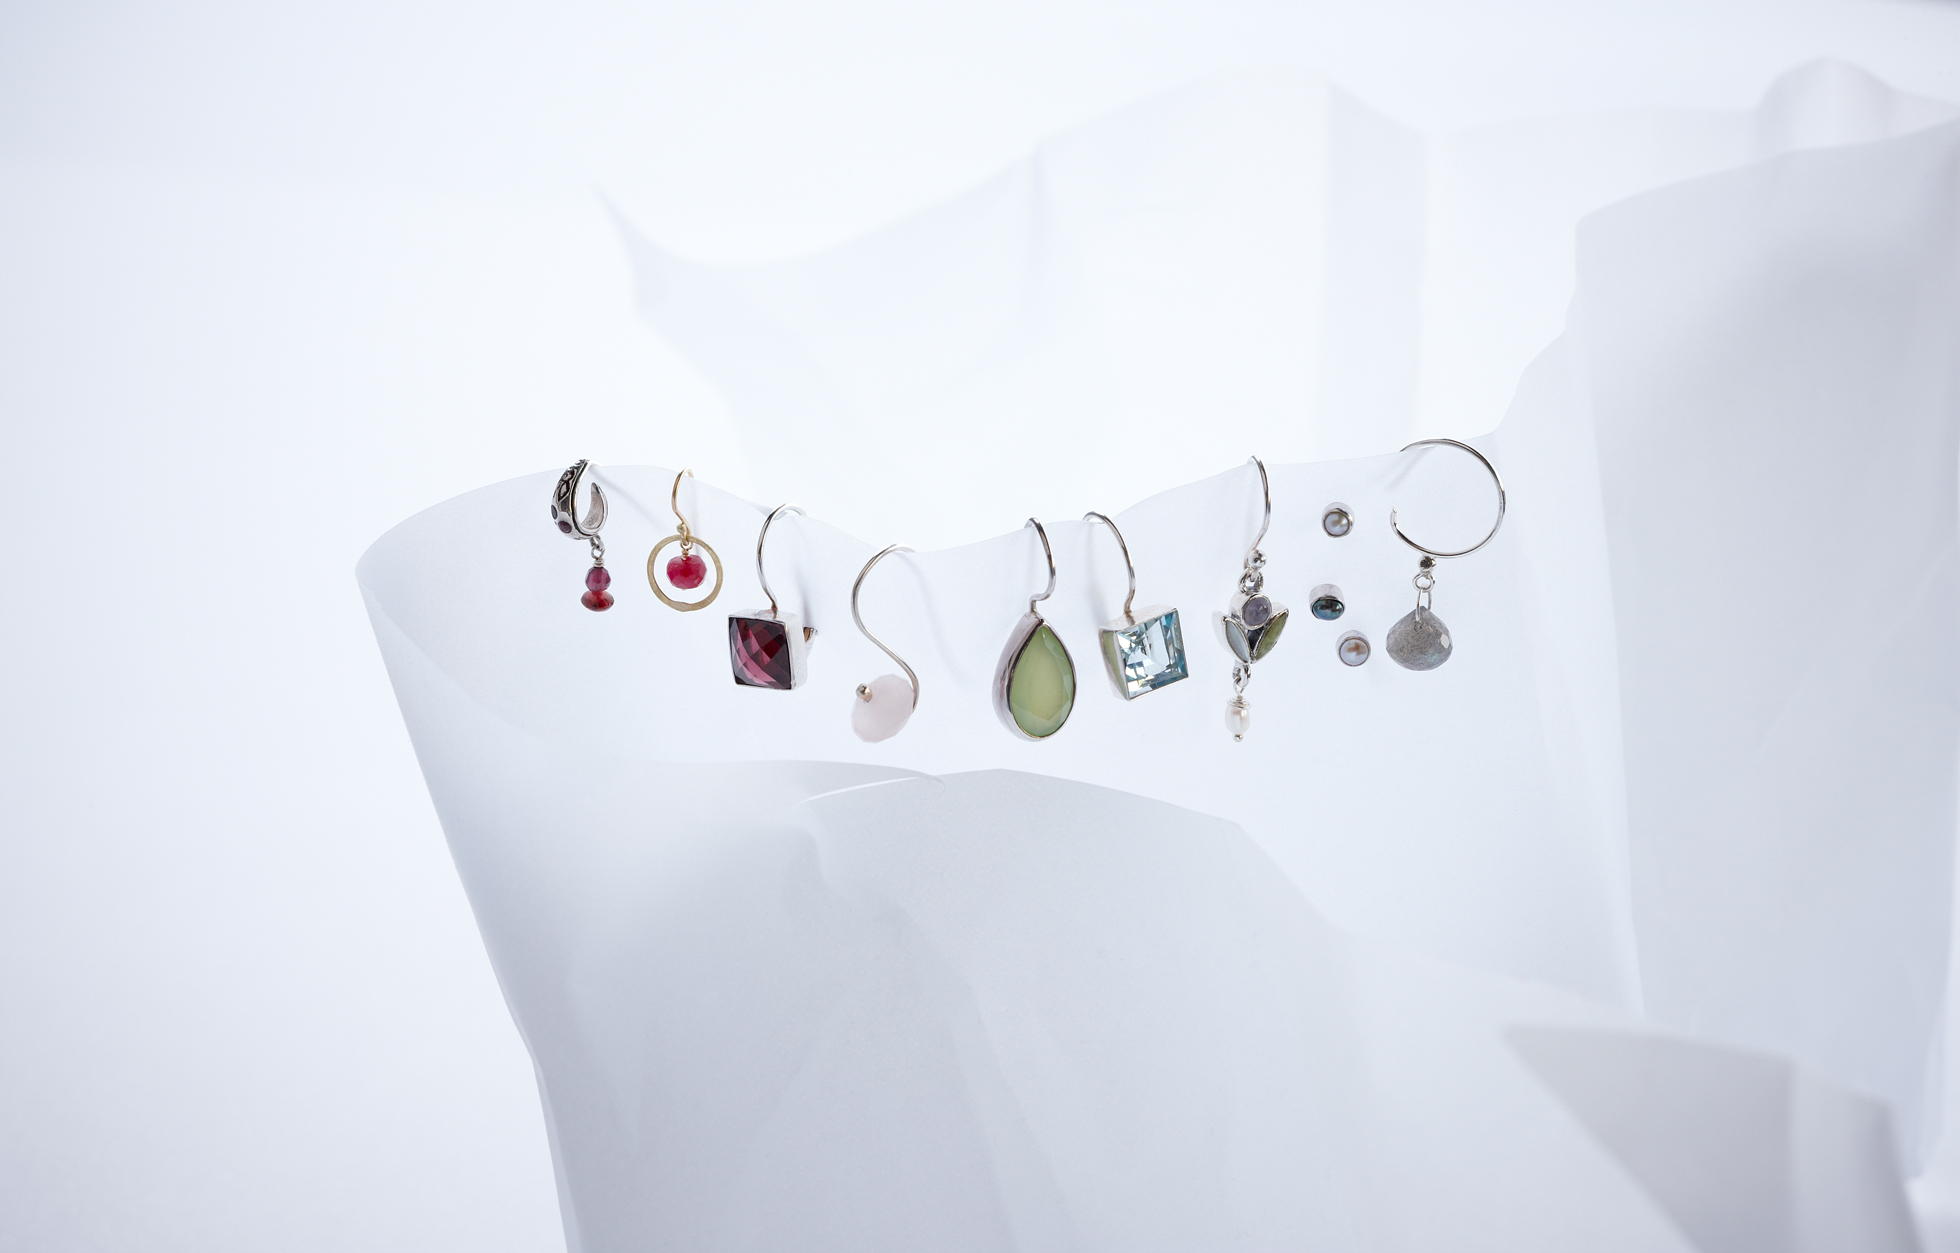 Product photography Jewelry Derek Israelsen Earrings Hanging